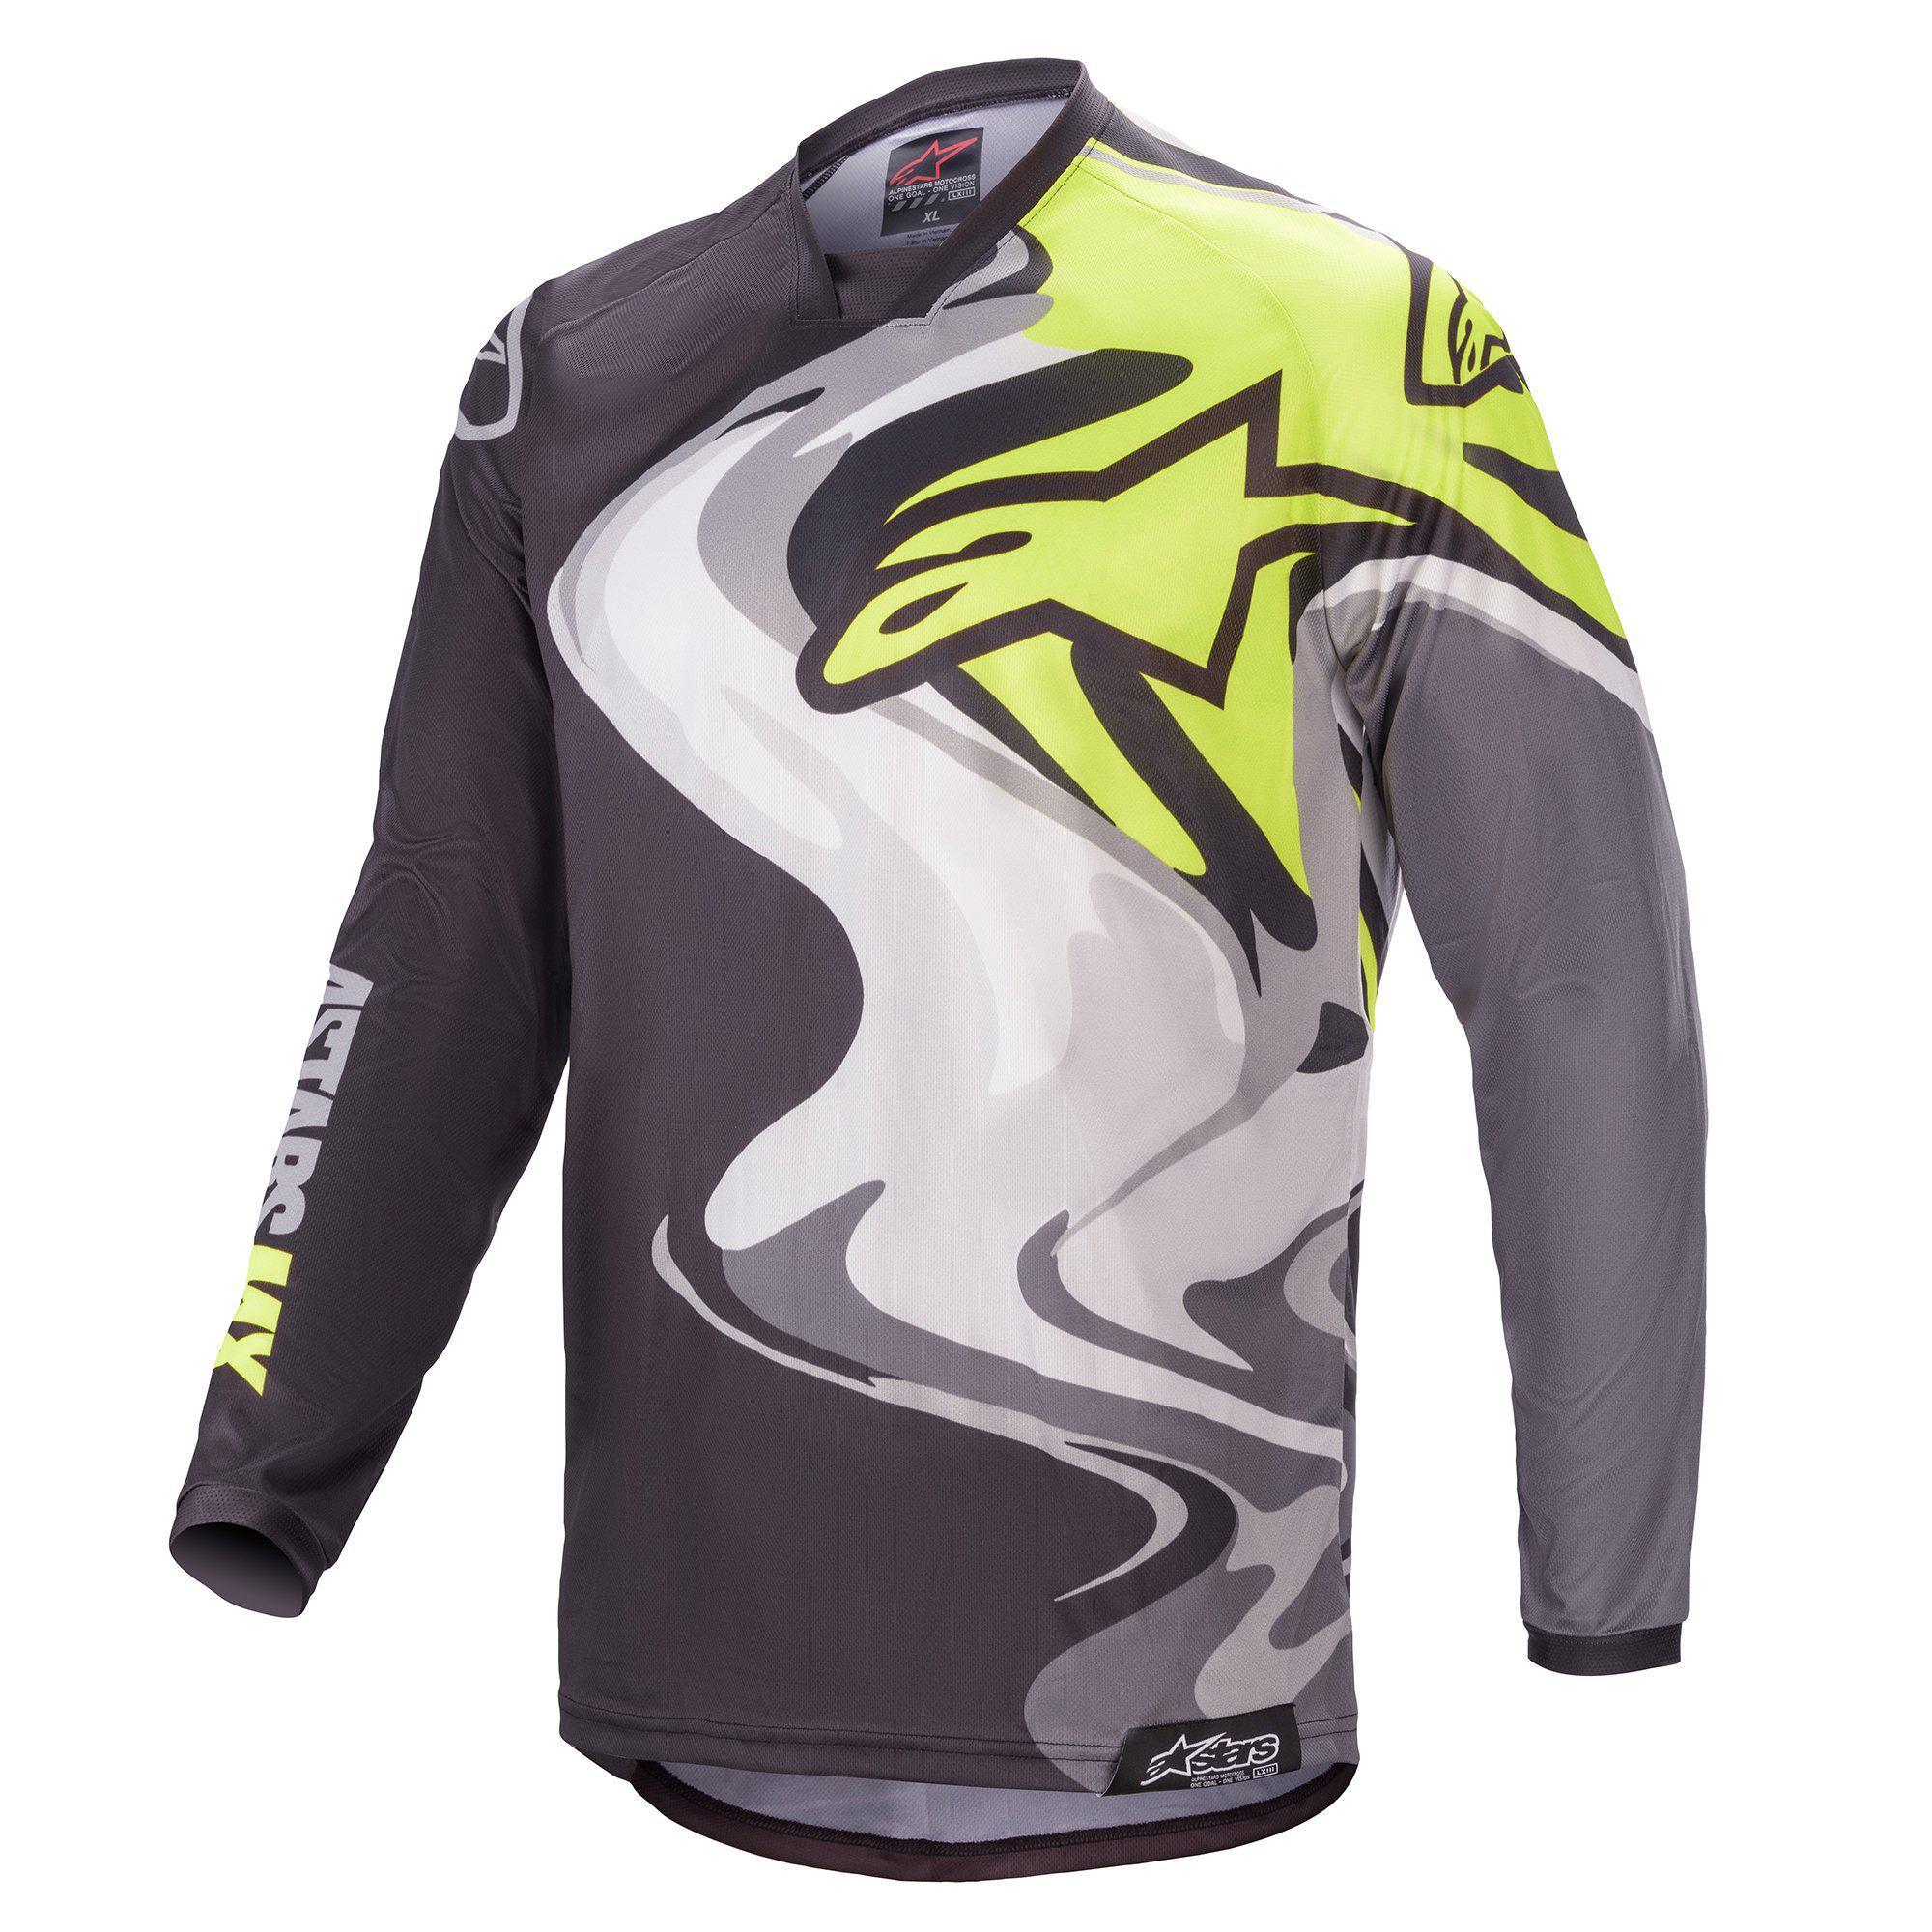 Alpinestars Racer Flagship Motocross Jersey Image